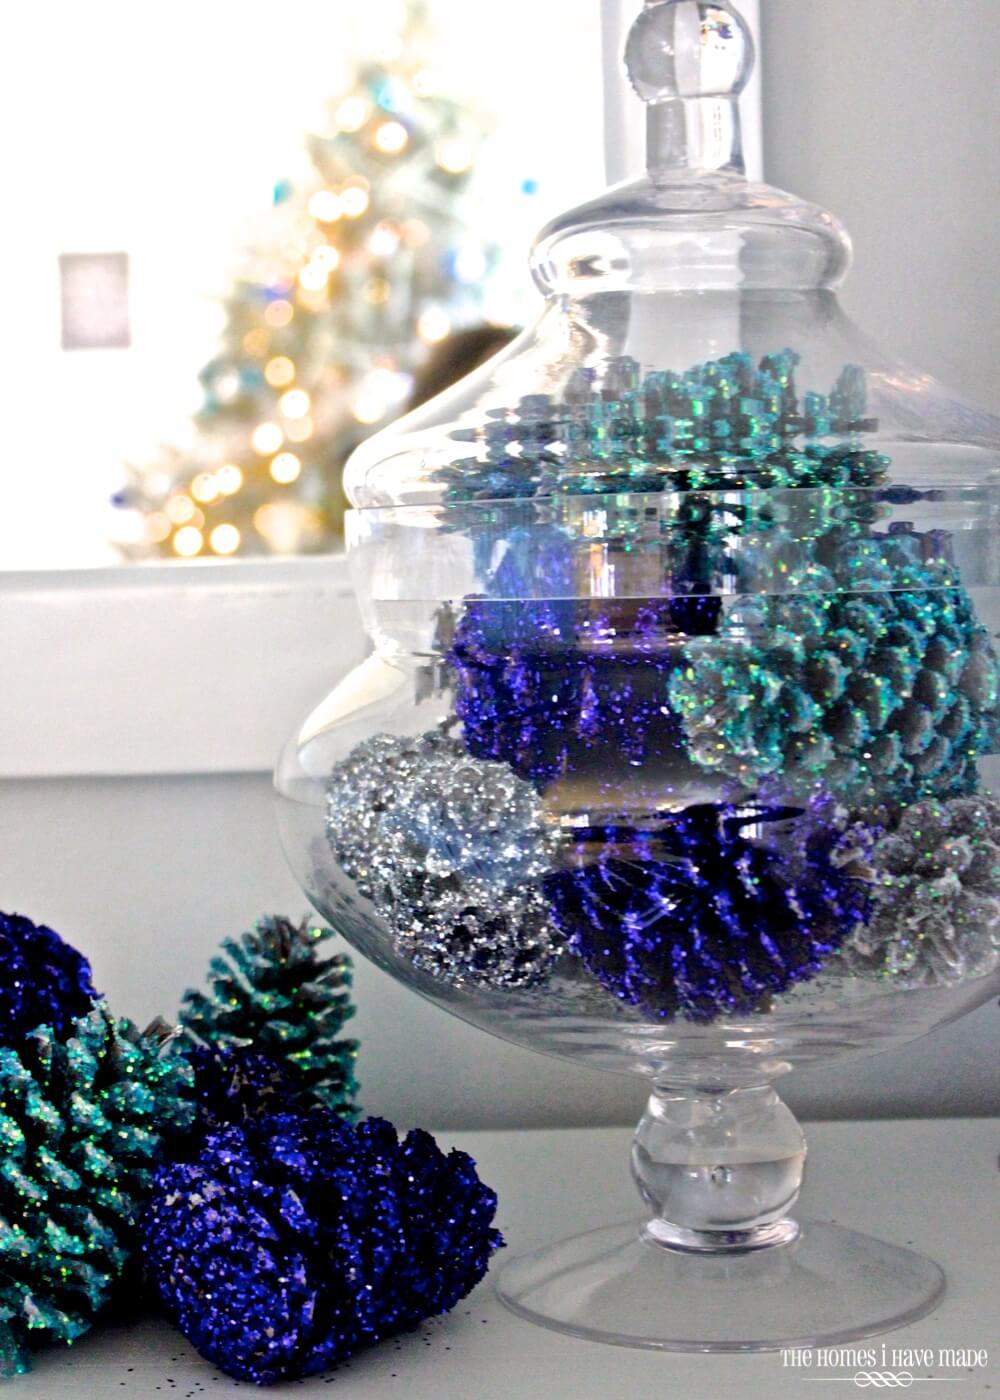 Versatile Festive Glittered Pinecone Display